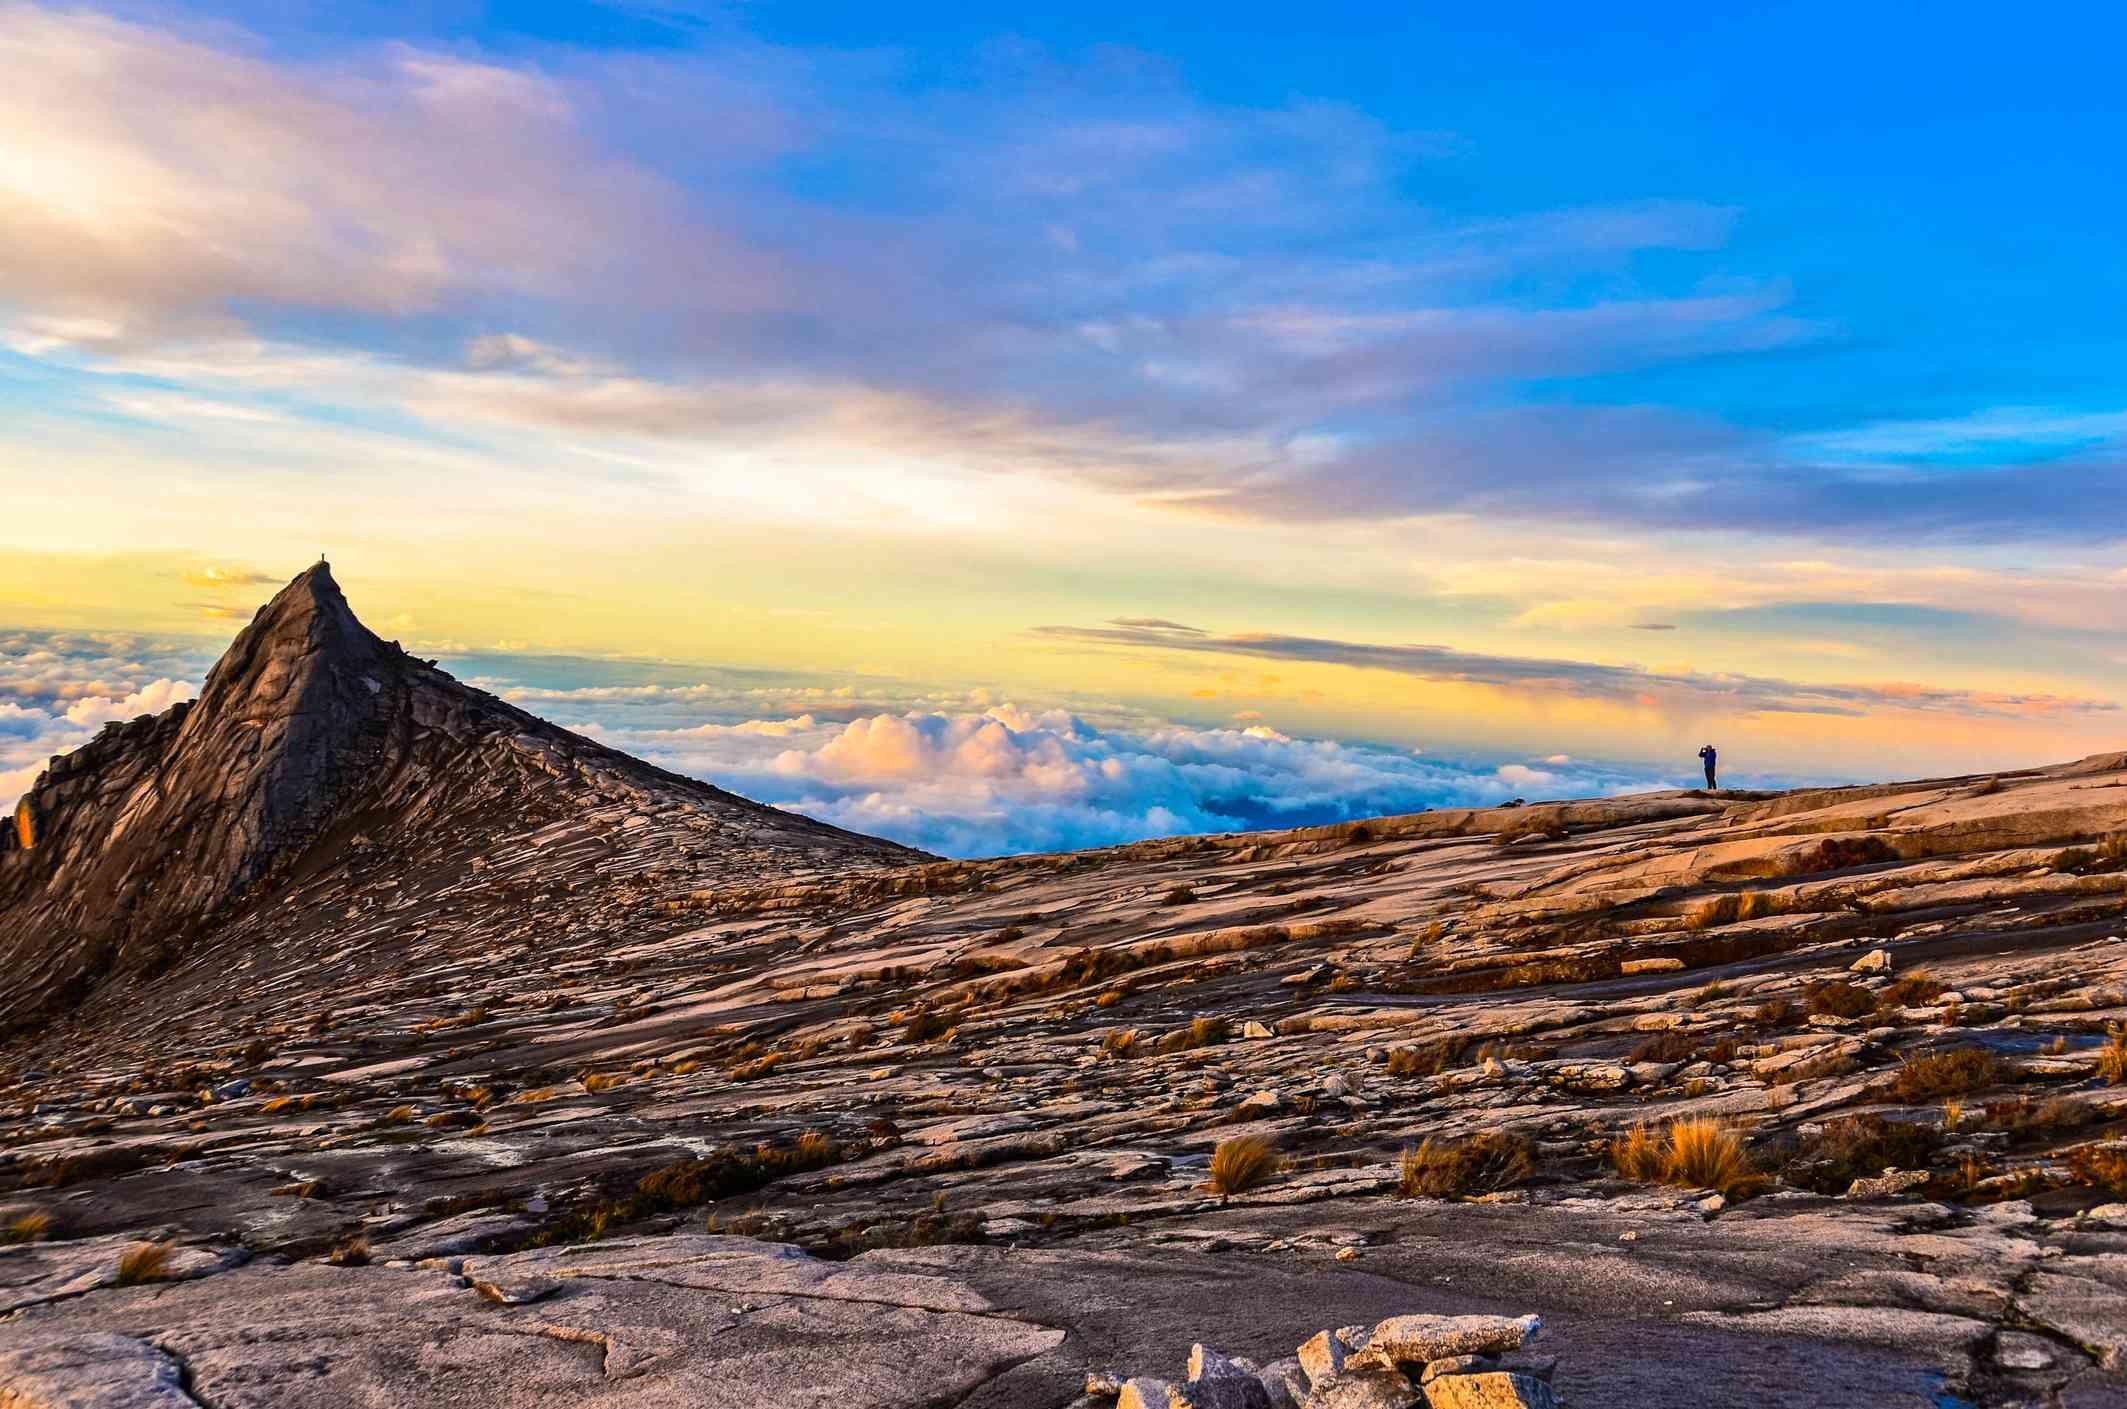 Sunrise over Mount Kinabalu, Malaysia